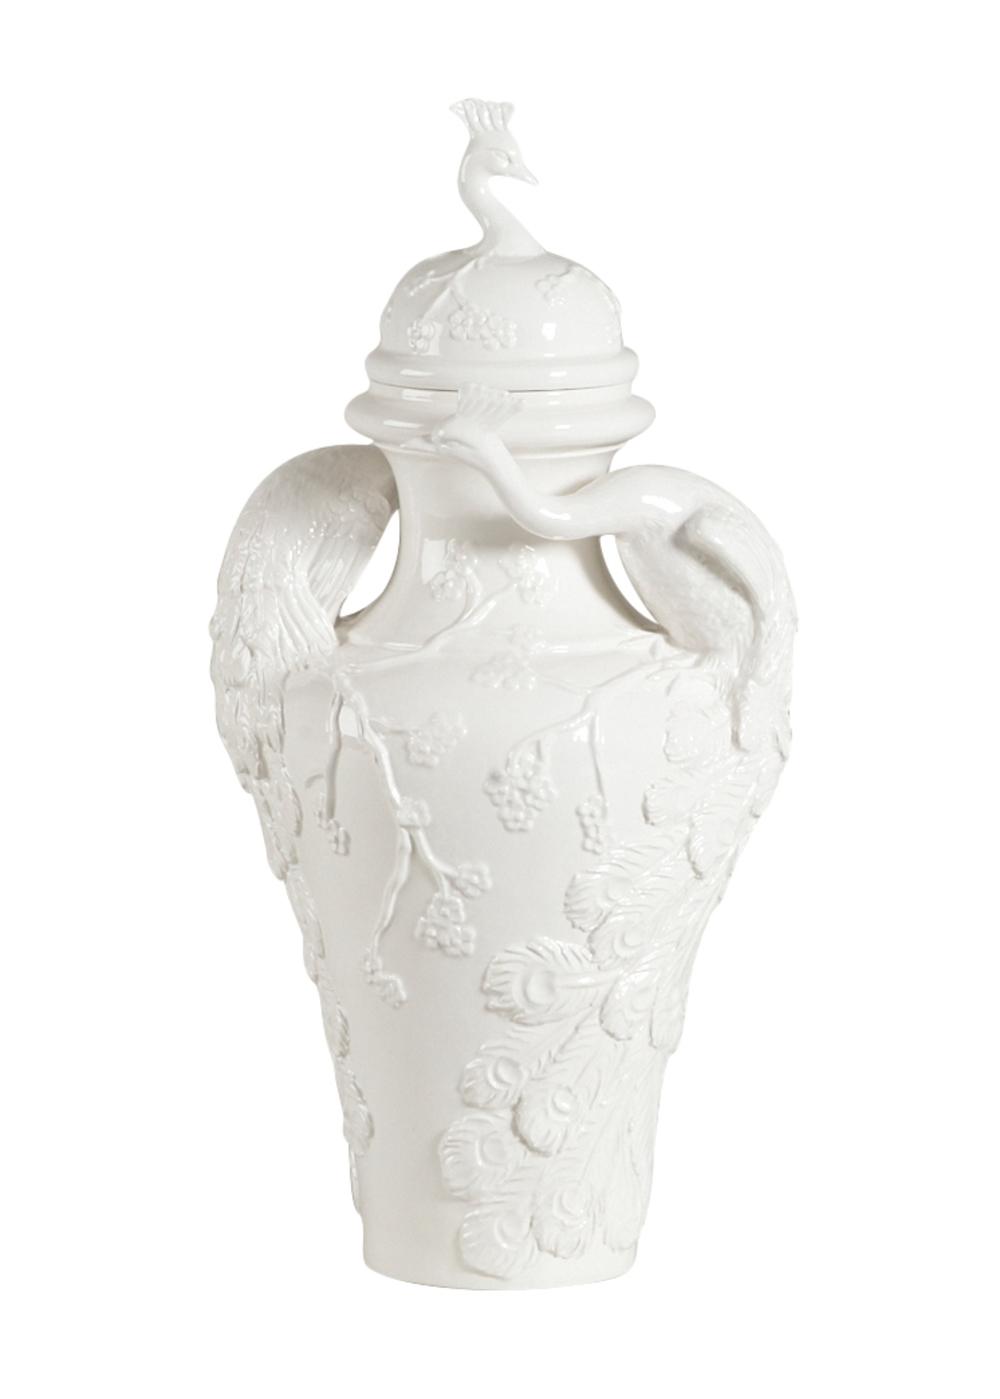 Chelsea House - Peacock Ceramic Urn